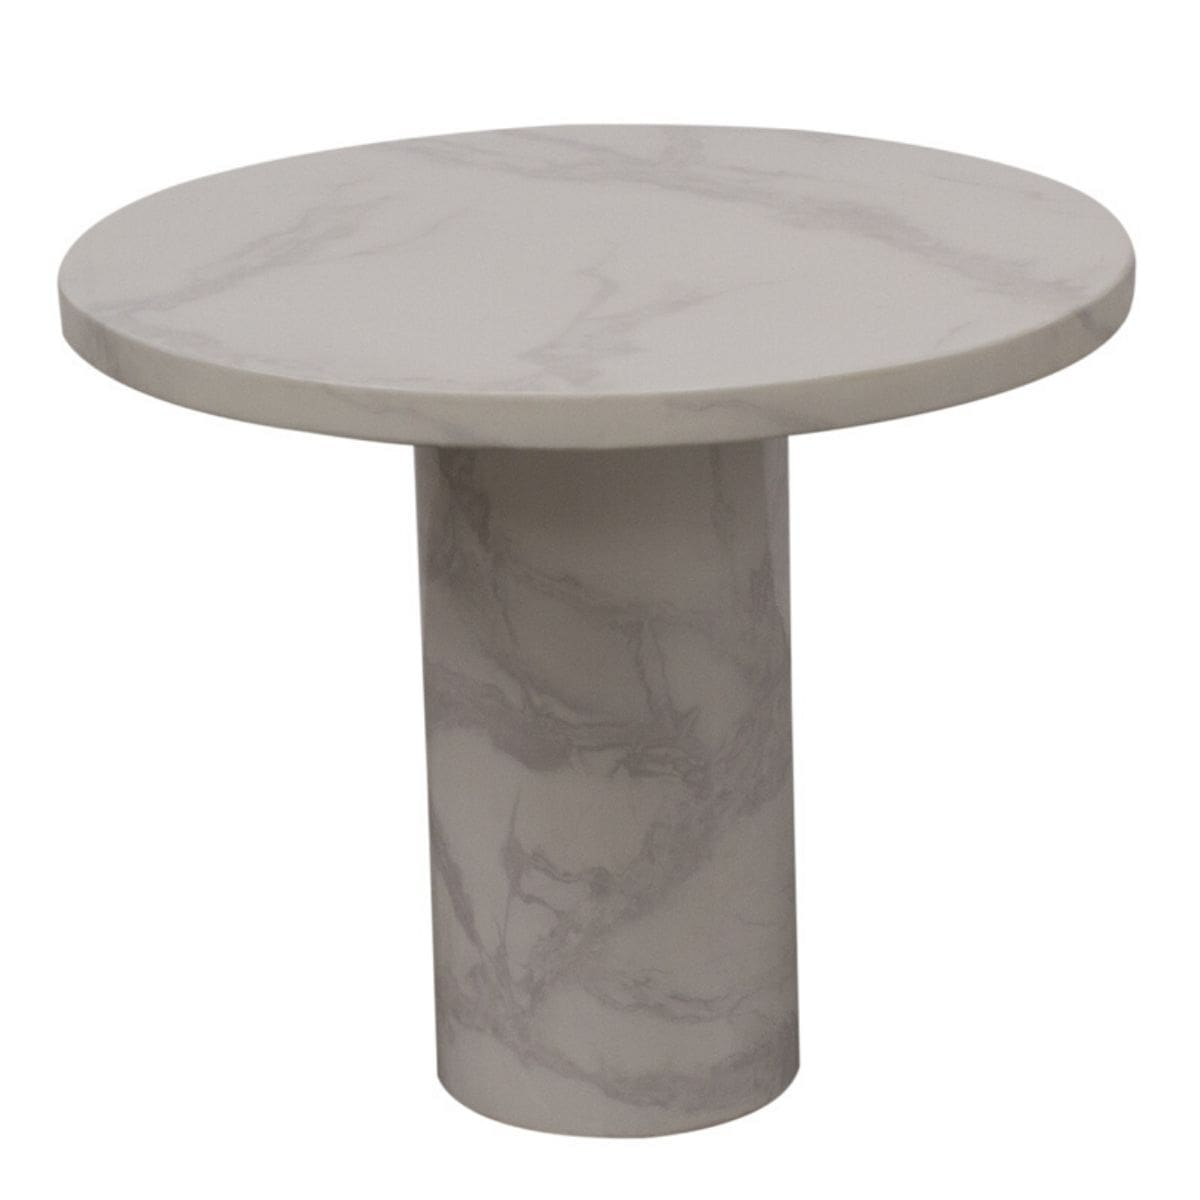 Caleb White Marble Lamp Table